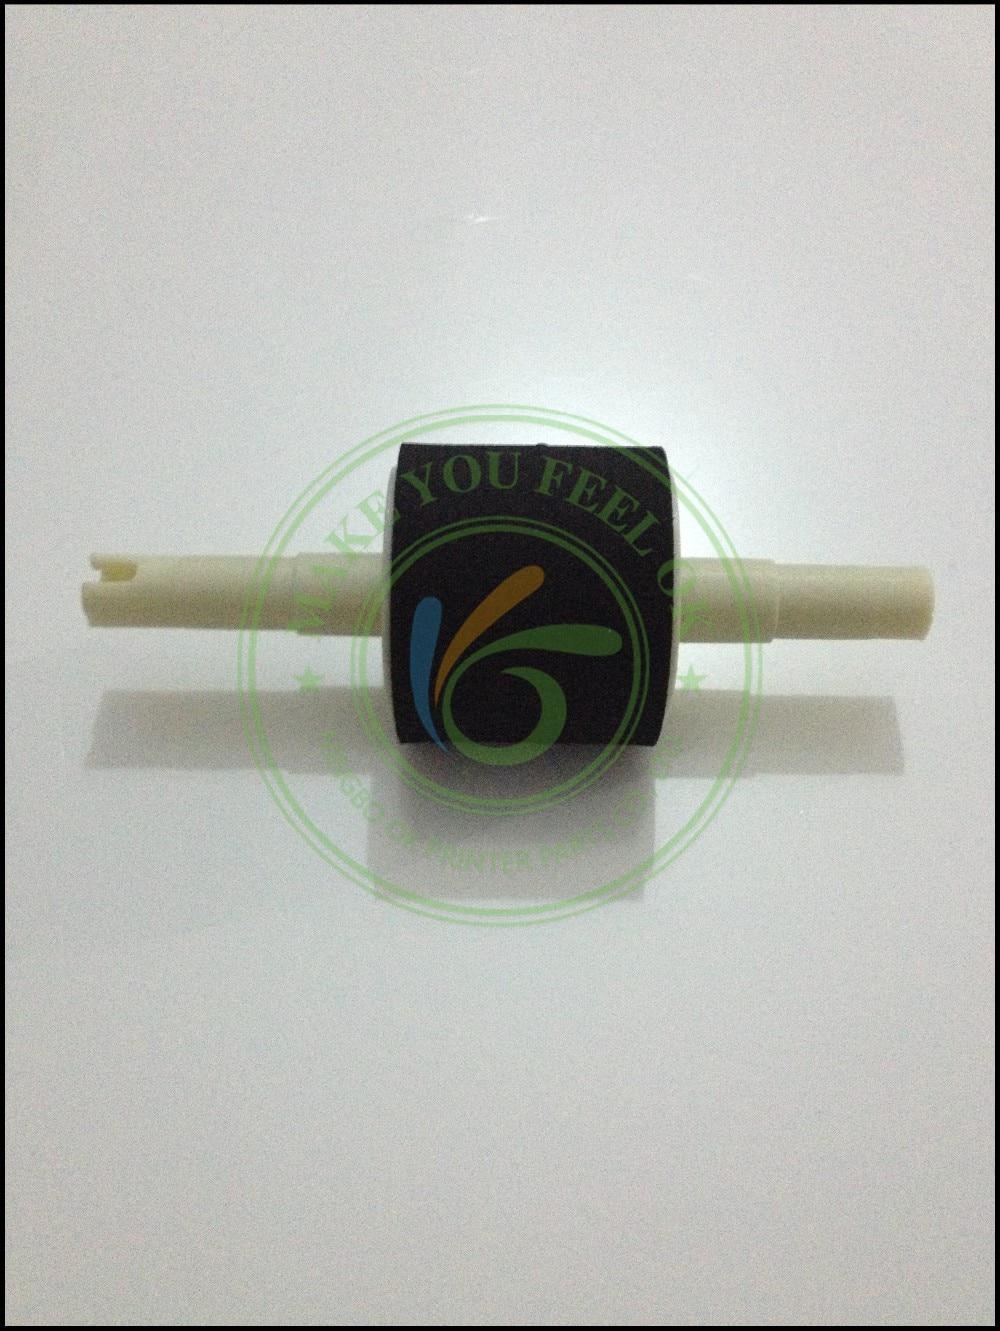 10PCX Совместимость RL1-0542-000 RC1-3909-000 RL1-0542 RC1-3909 Бумага ролик для hp 2410 2420 2420D 2420DN 2430 2430N